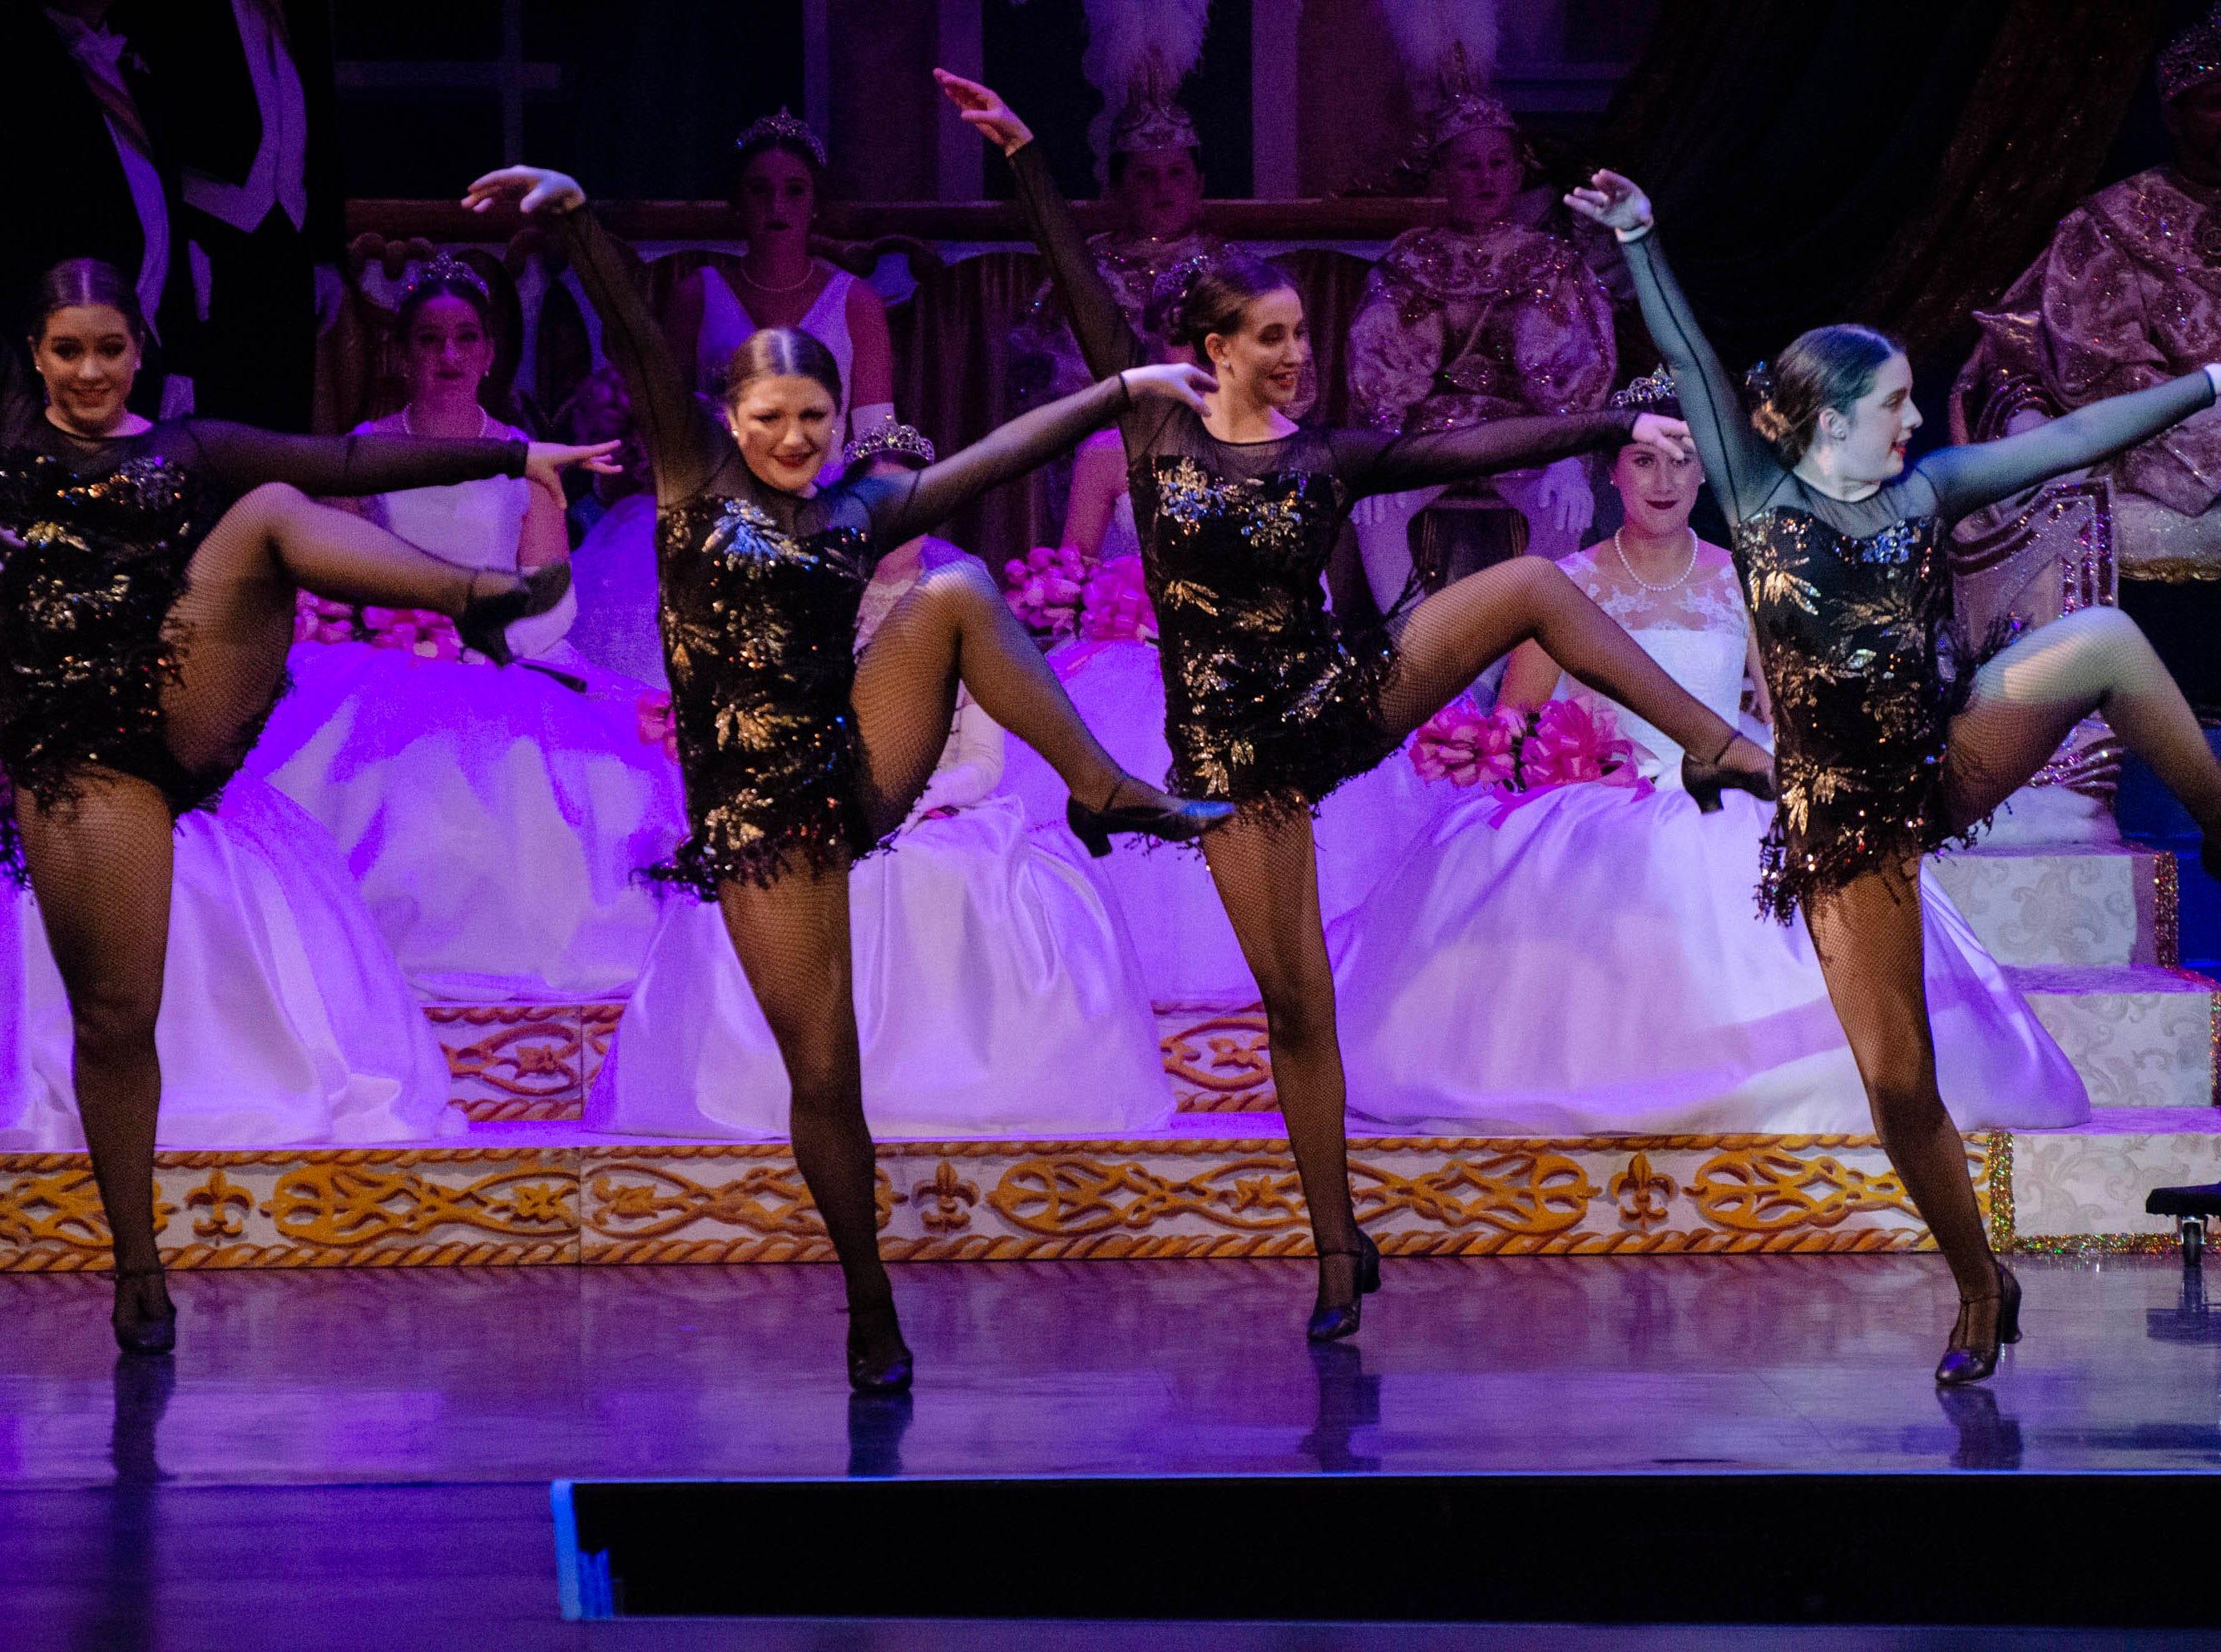 Krewe de Gabriel presents its 80th Annual Mardi Gras Ball